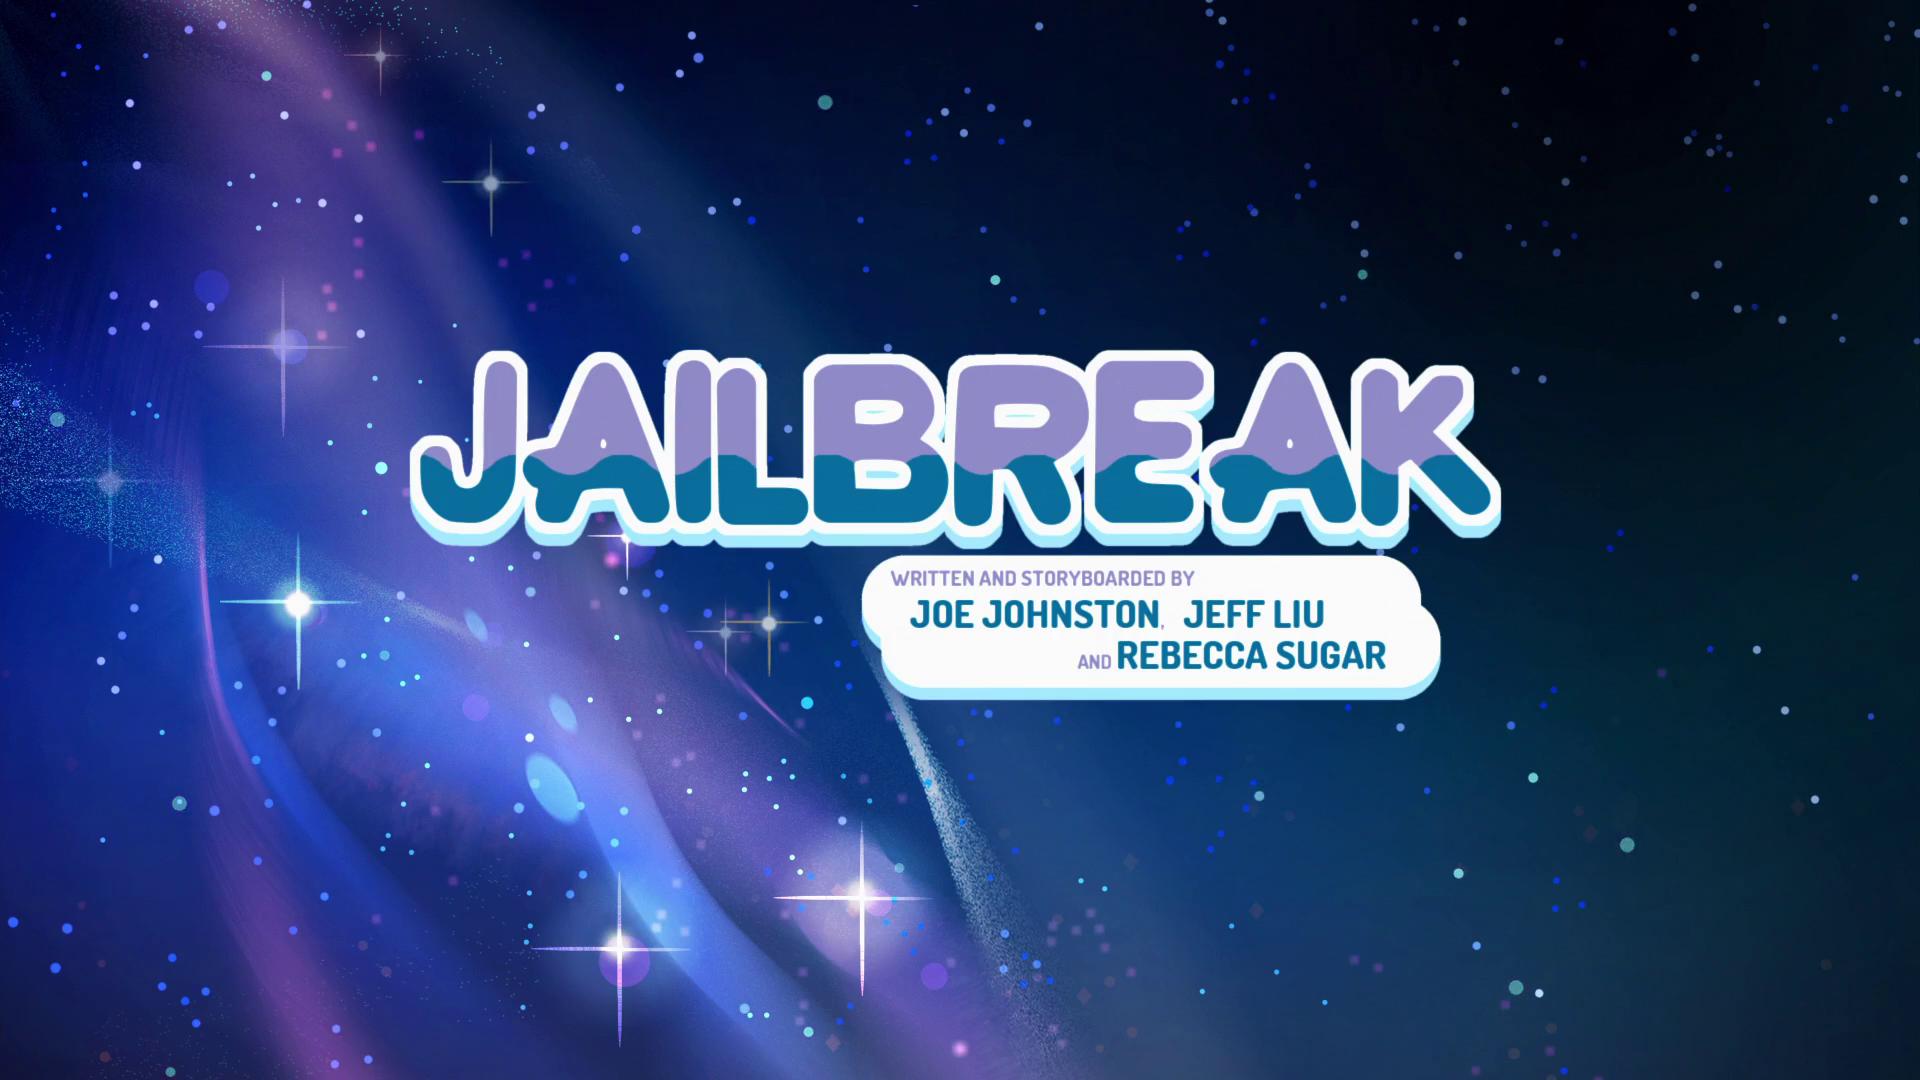 Tiedosto:Jail Break 000.png